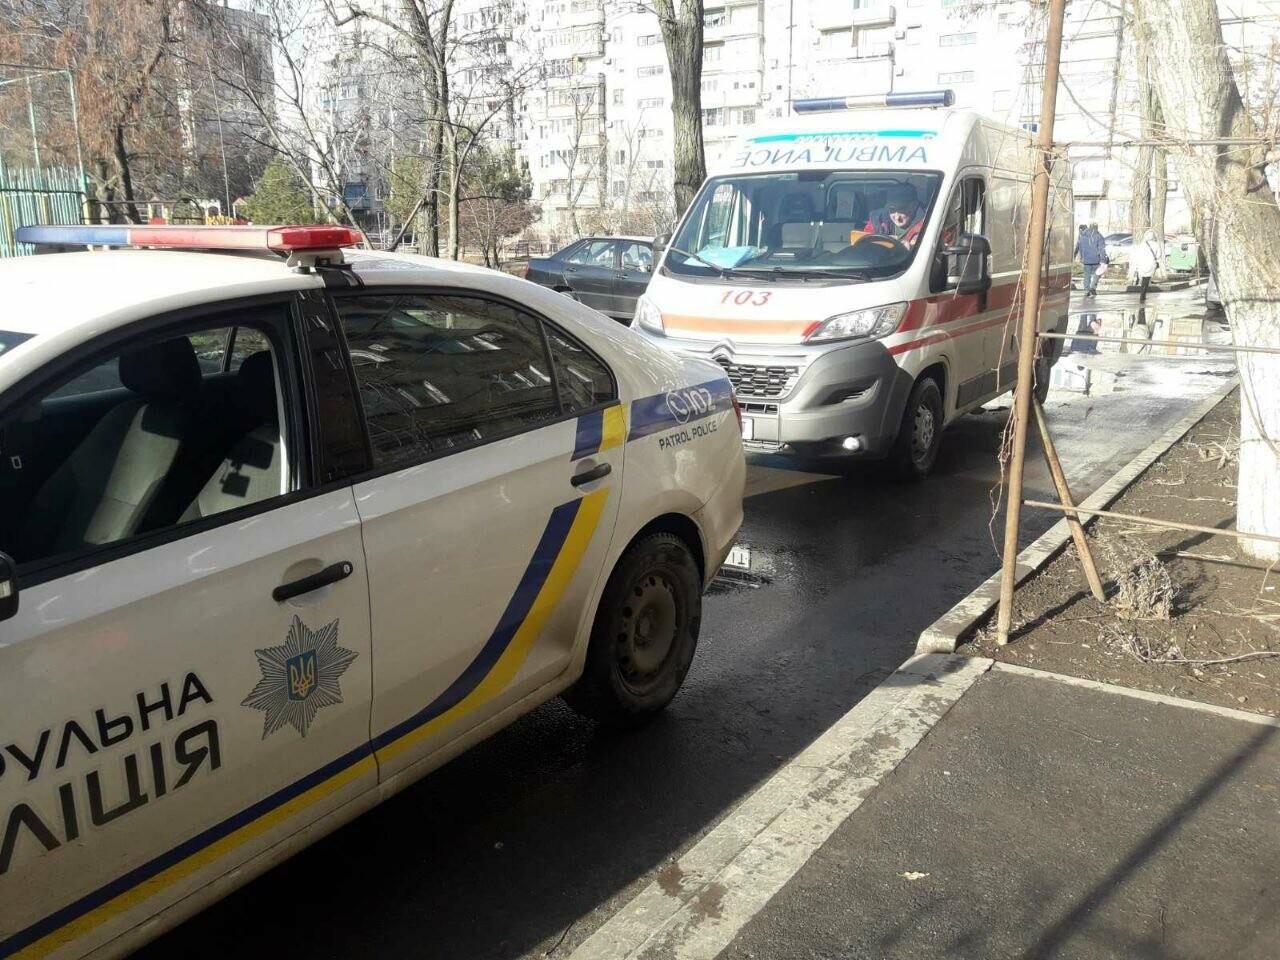 В Мариуполе пенсионерка кормила голубей и попала под колеса авто, - ФОТО, ВИДЕО, фото-4